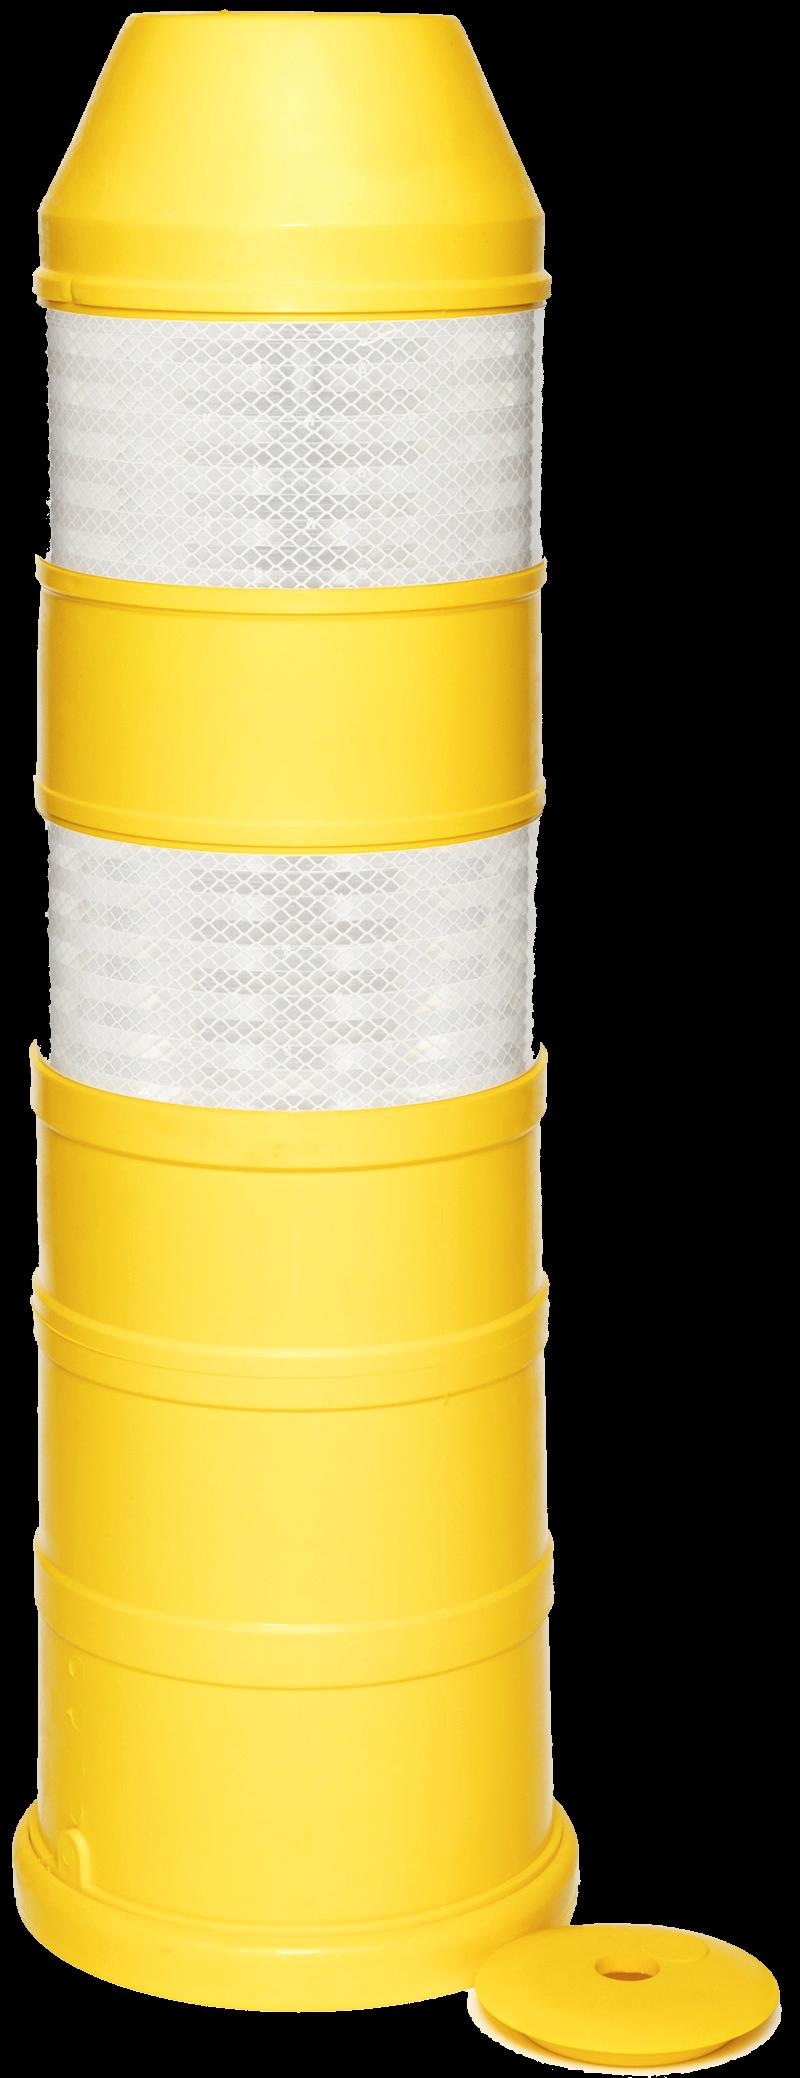 Plooibaken, diam. 220mm, H 750mm geel HI